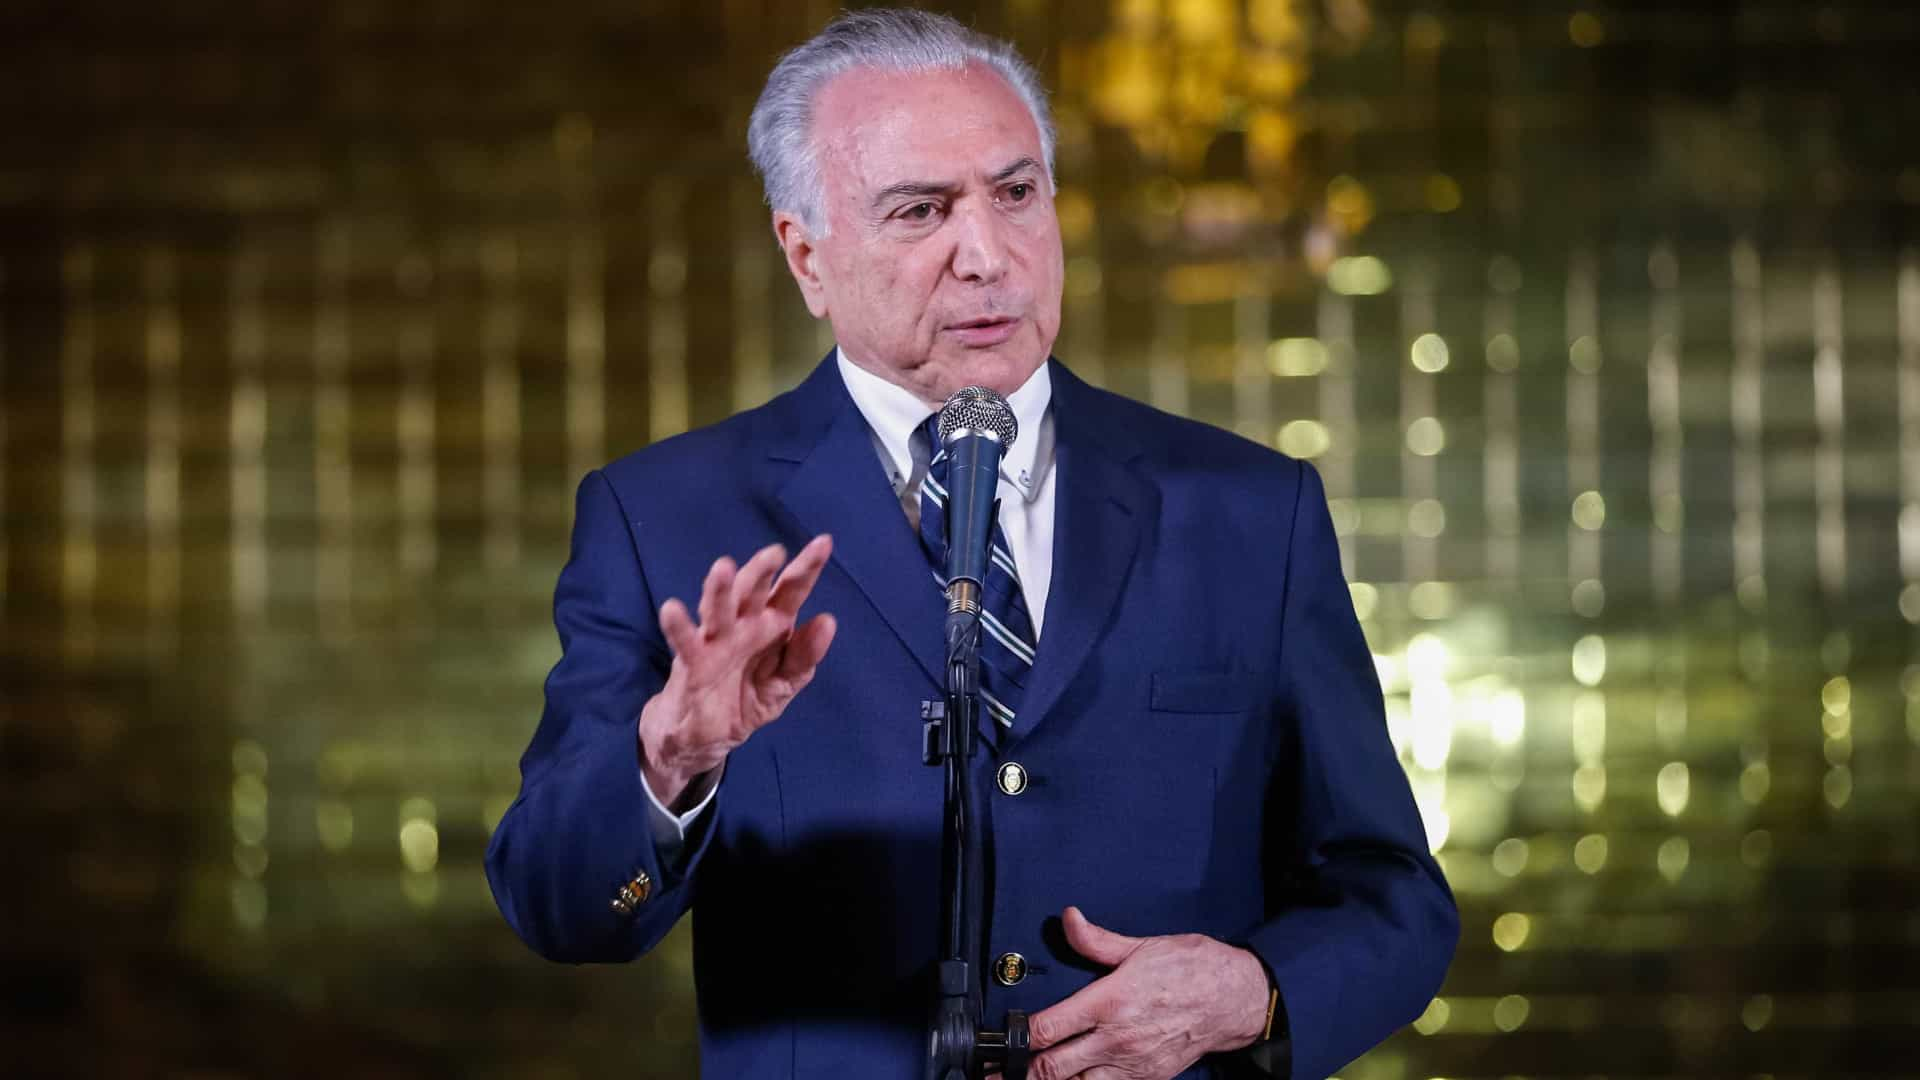 Em entrevista, Temer elogia Dilma: 'senhora correta, honesta'